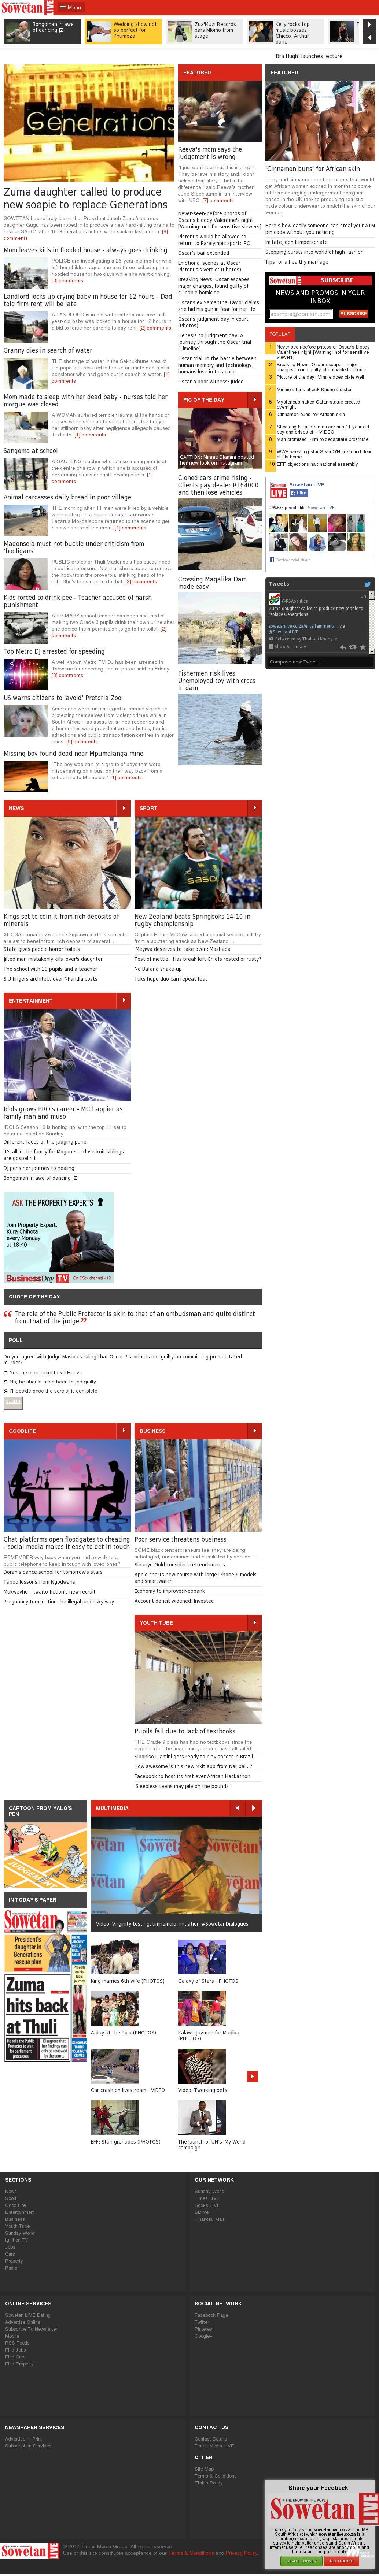 Sowetan Live at Sunday Sept. 14, 2014, 8:17 p.m. UTC